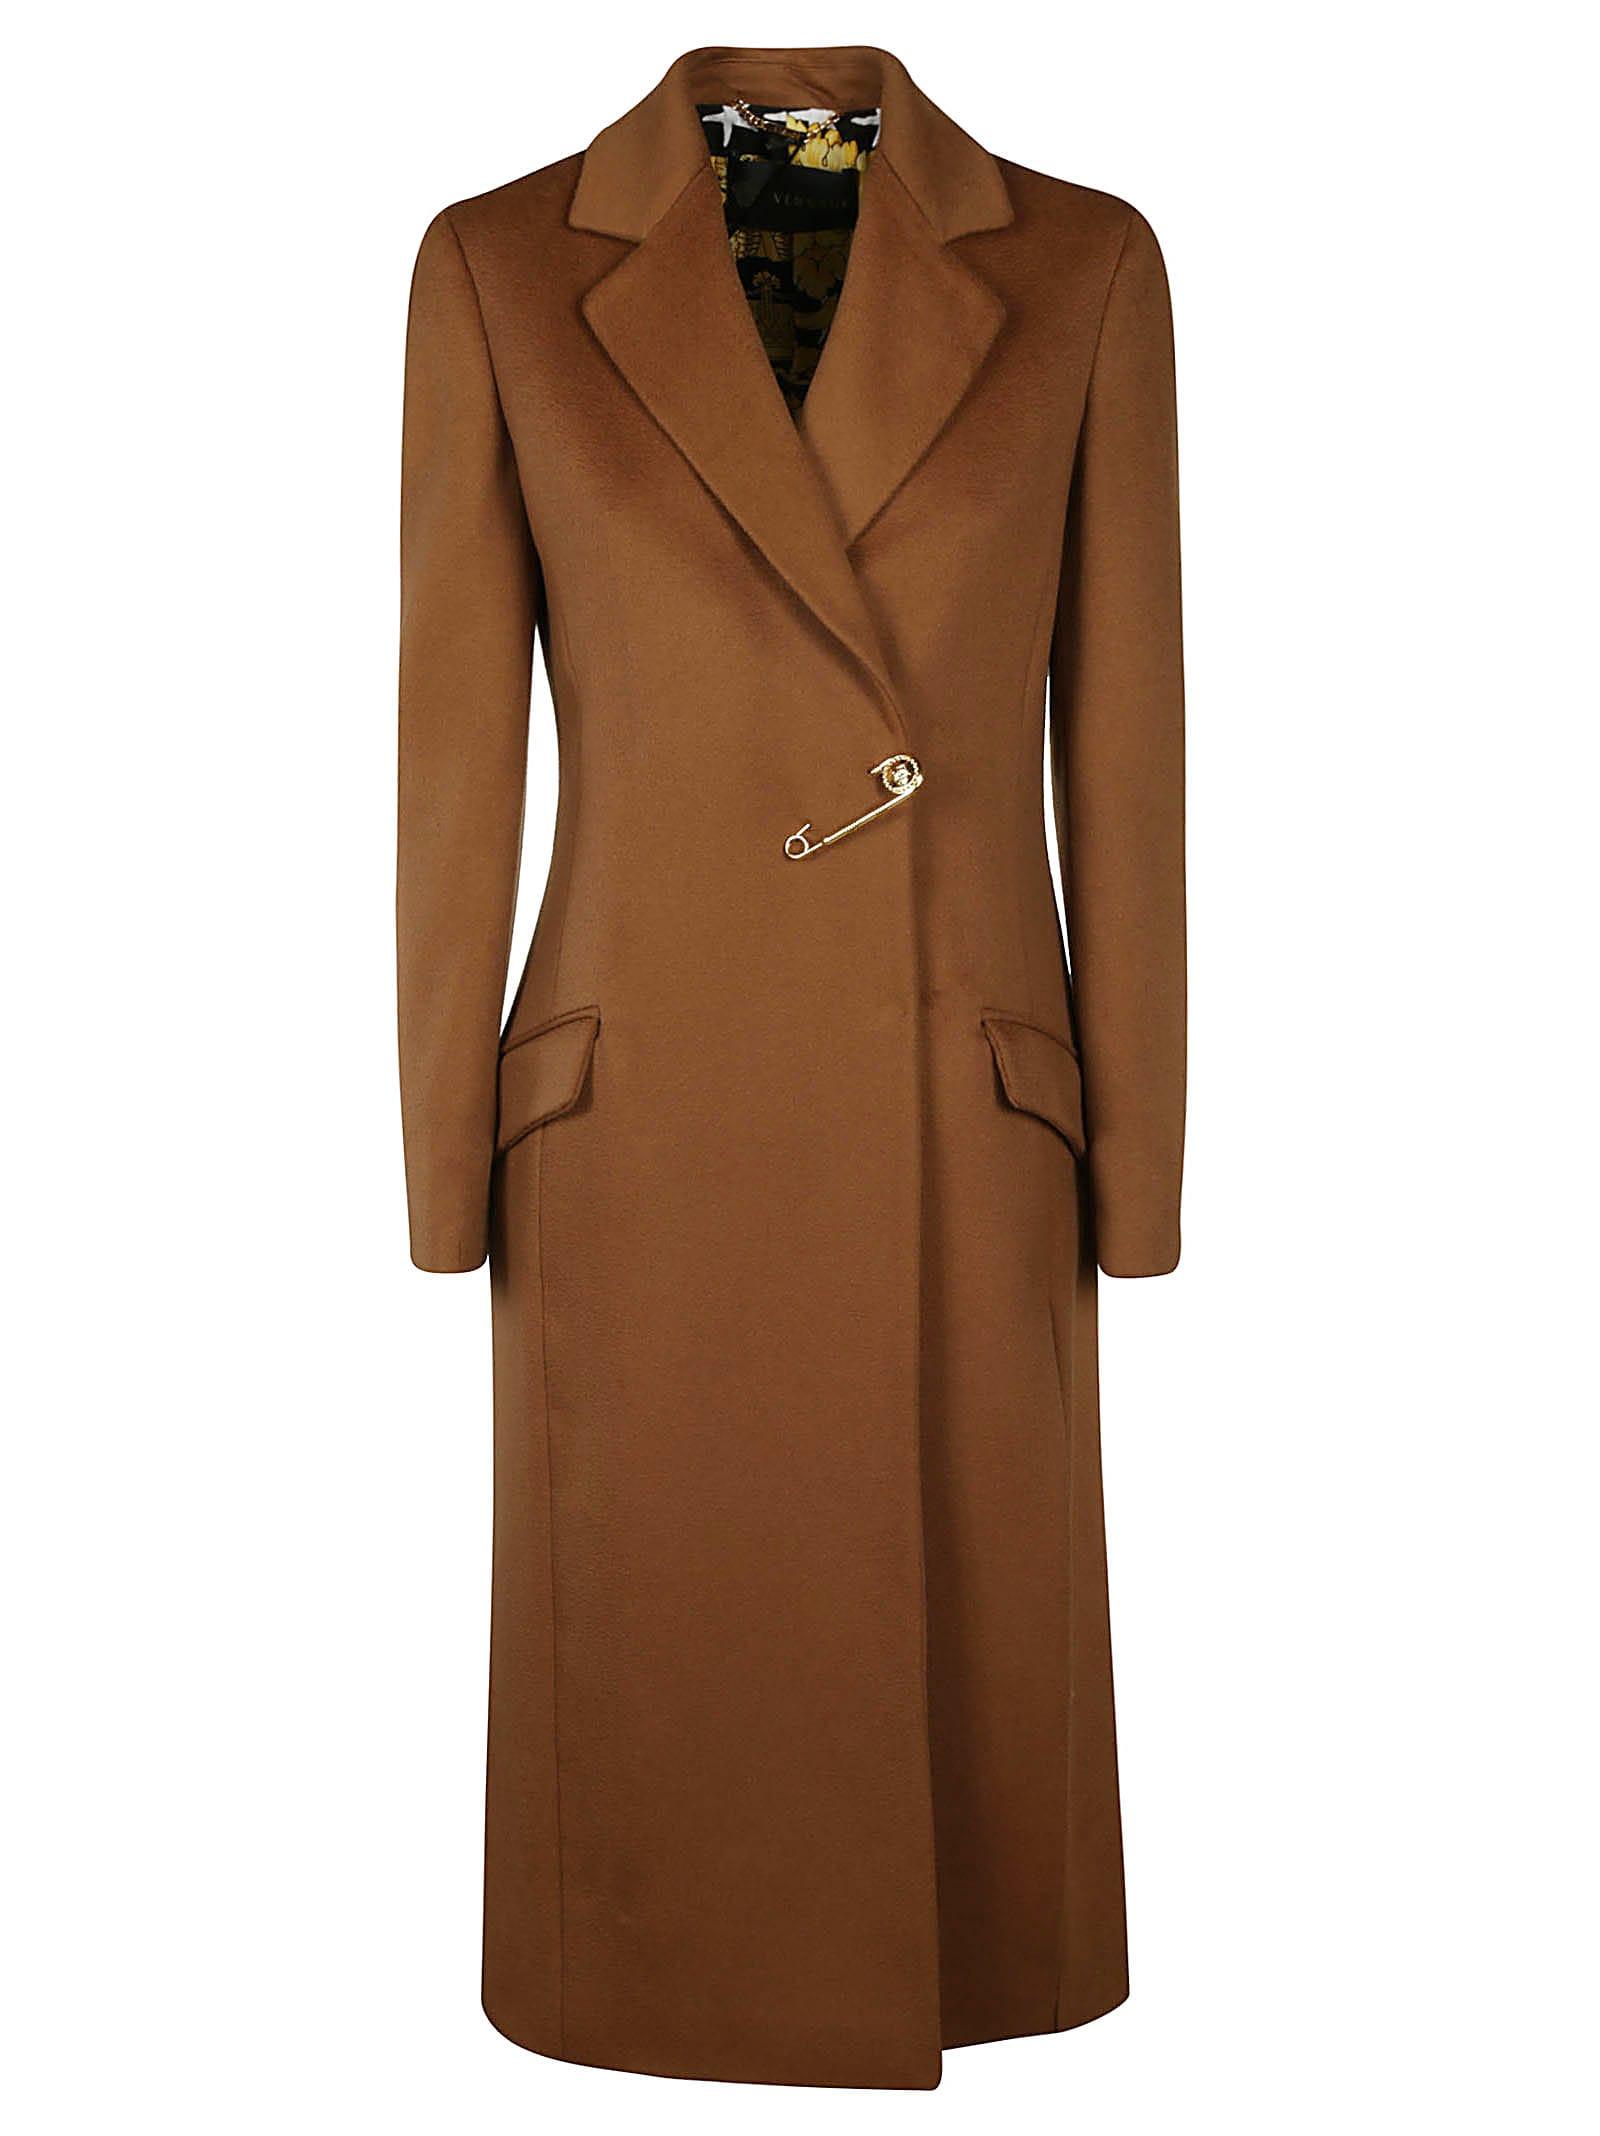 Versace Concealed Coat